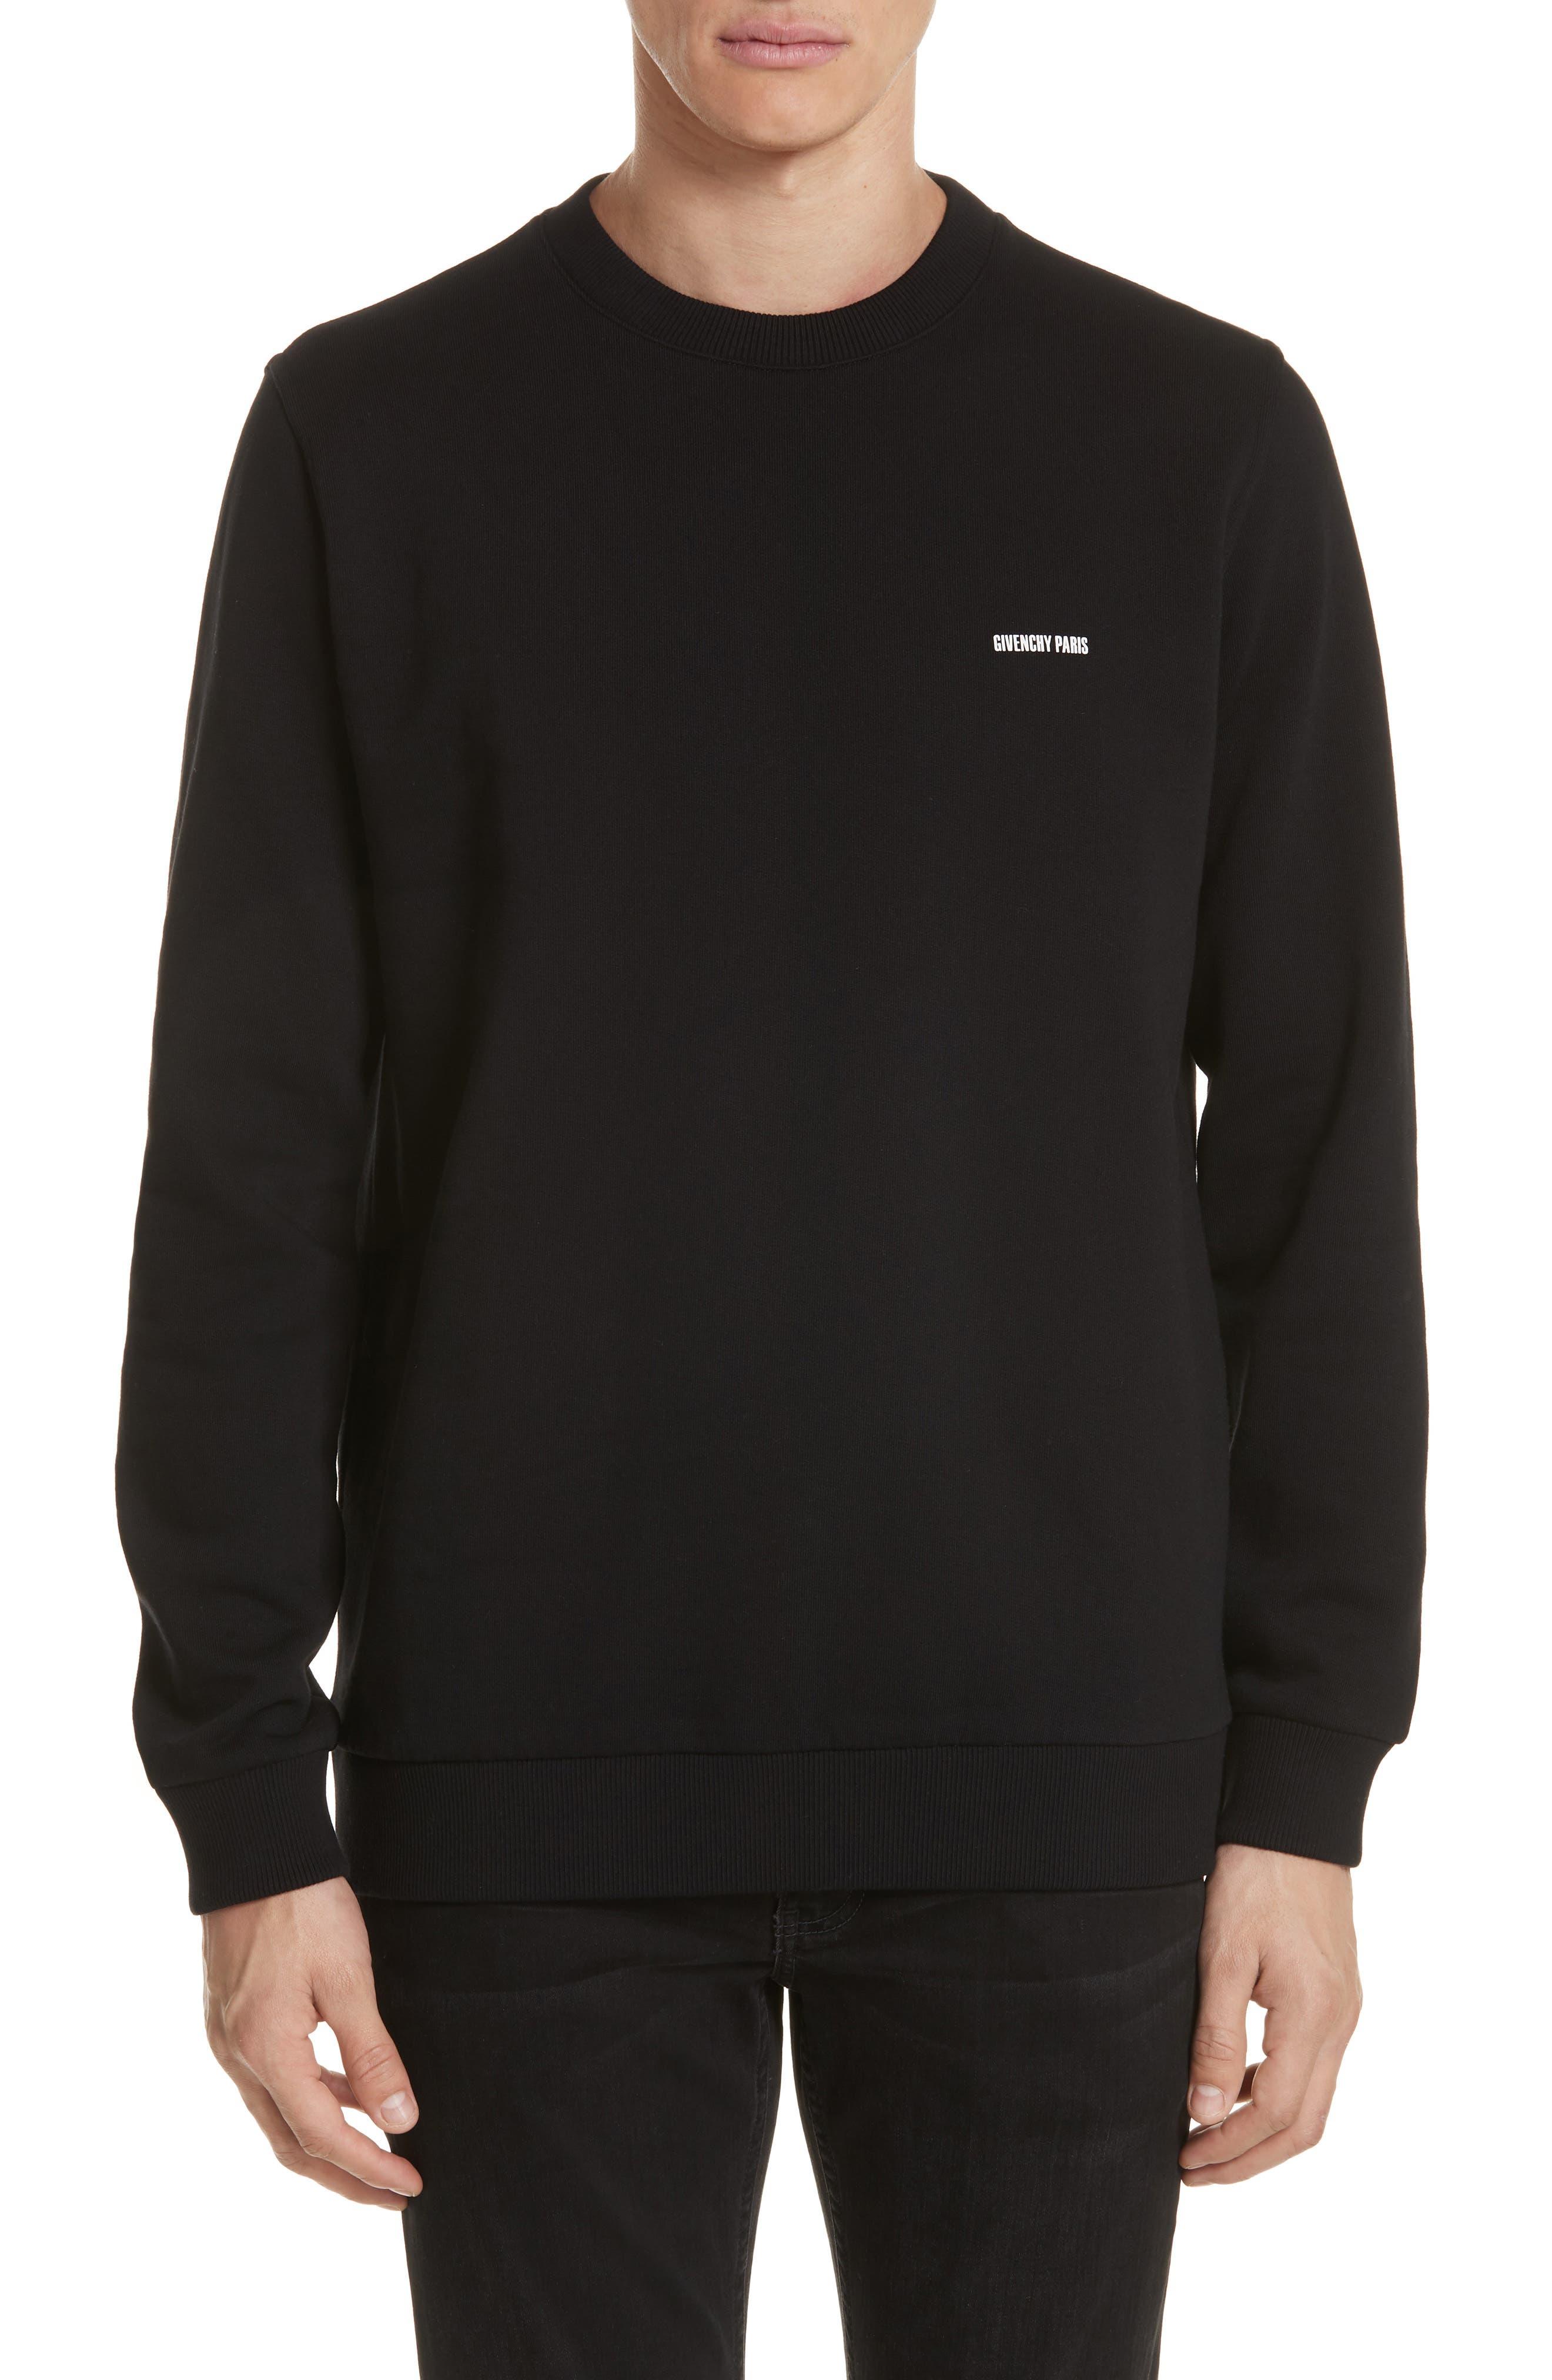 Original Crewneck Sweatshirt,                             Main thumbnail 1, color,                             001